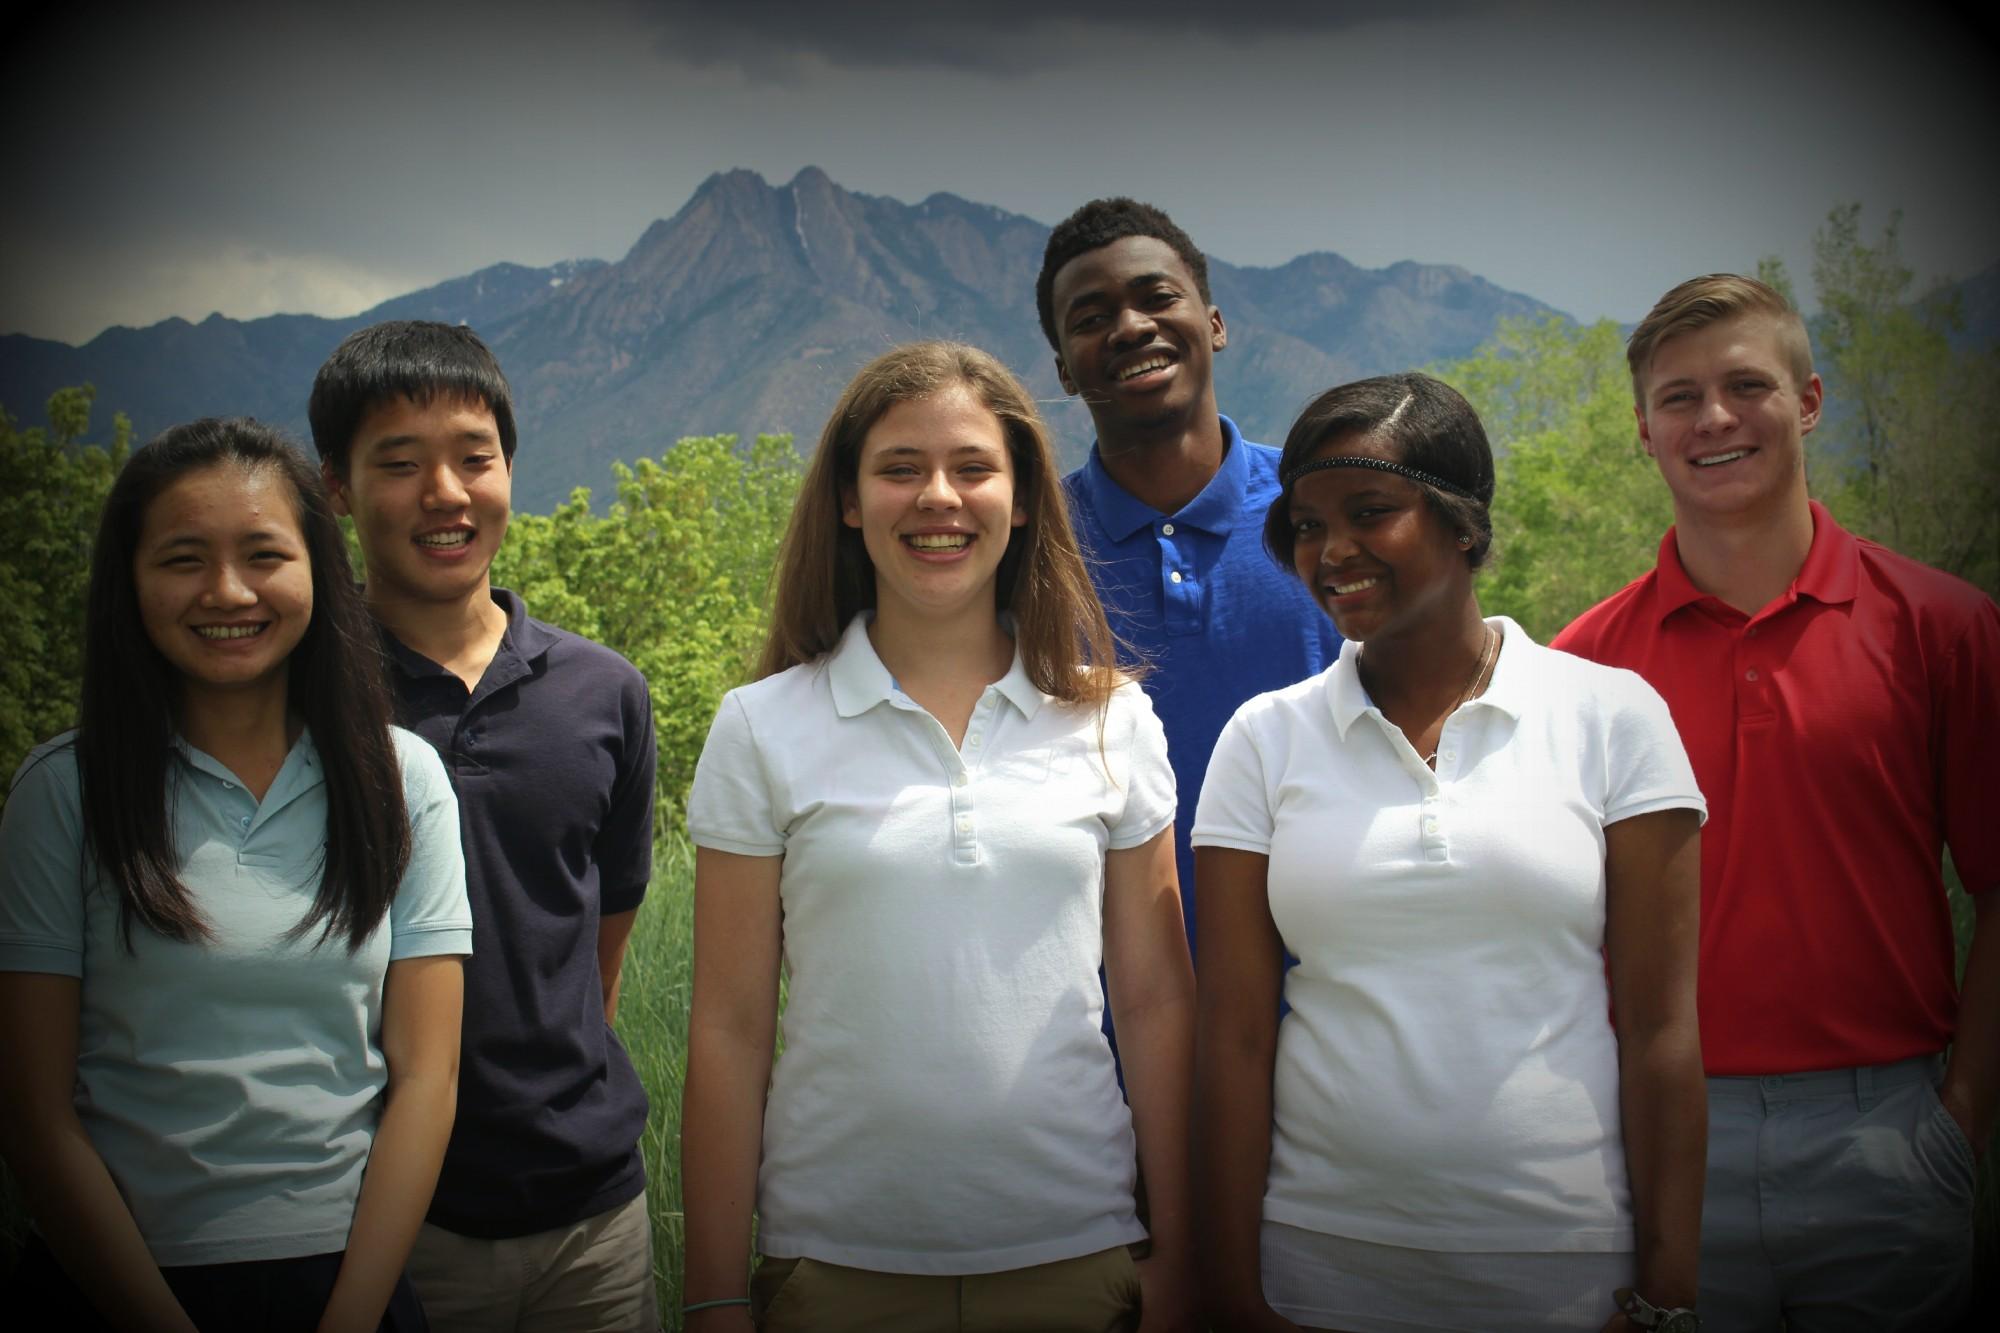 Mount Vernon Academy – Private School in Salt Lake City